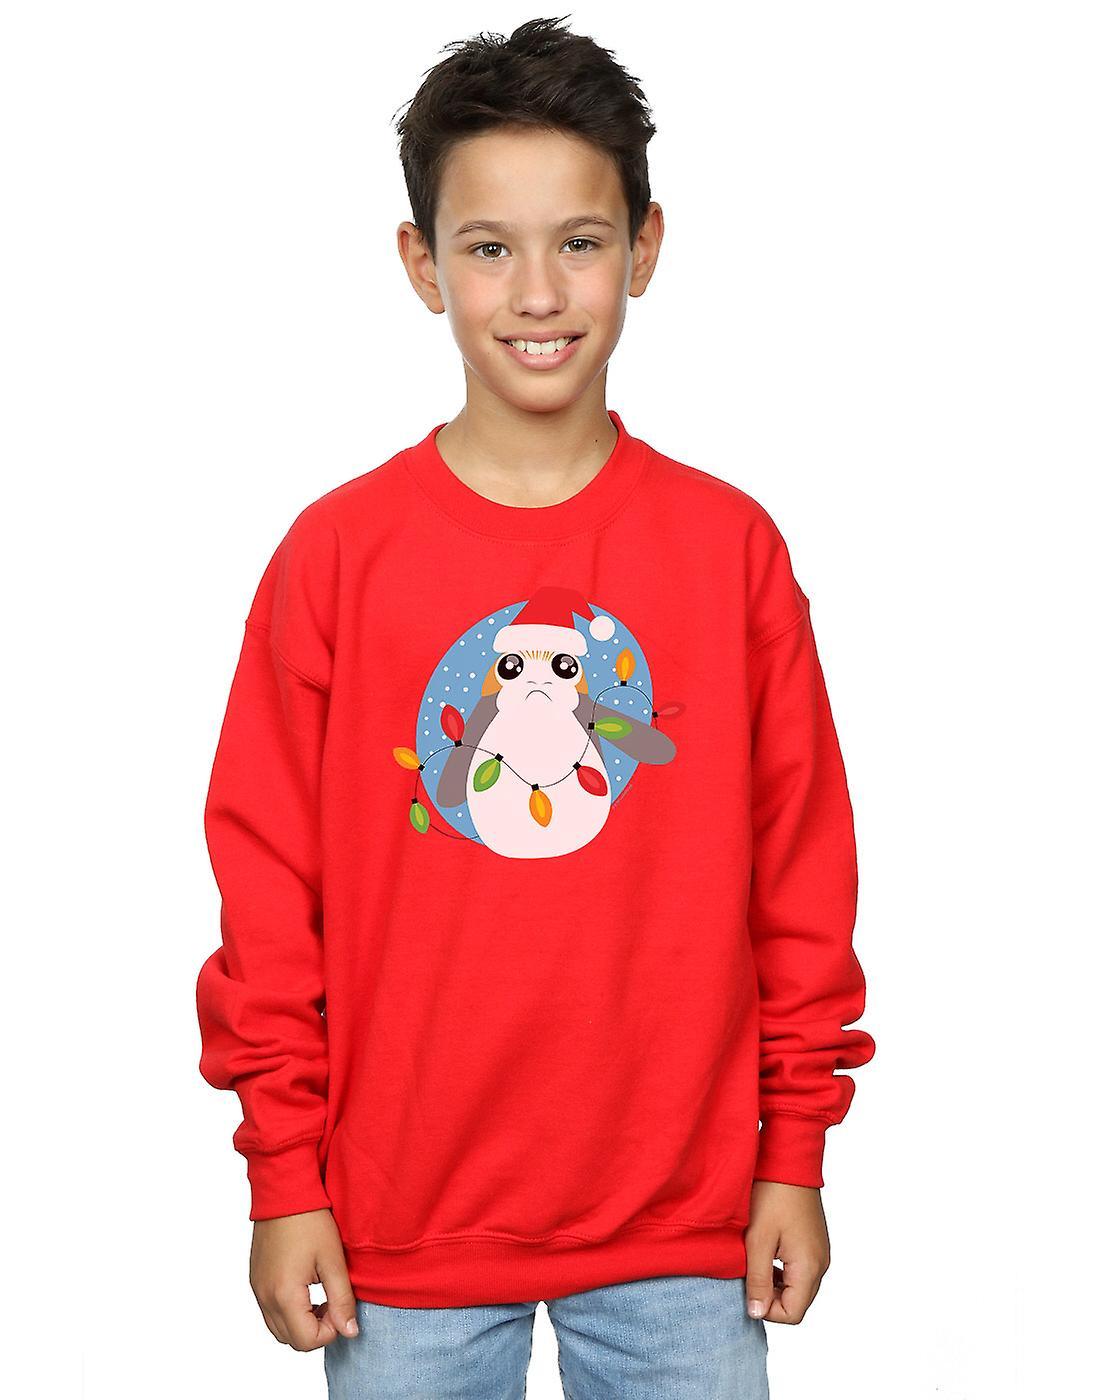 Star Wars Boys The Last Jedi Porg Christmas Lights Sweatshirt